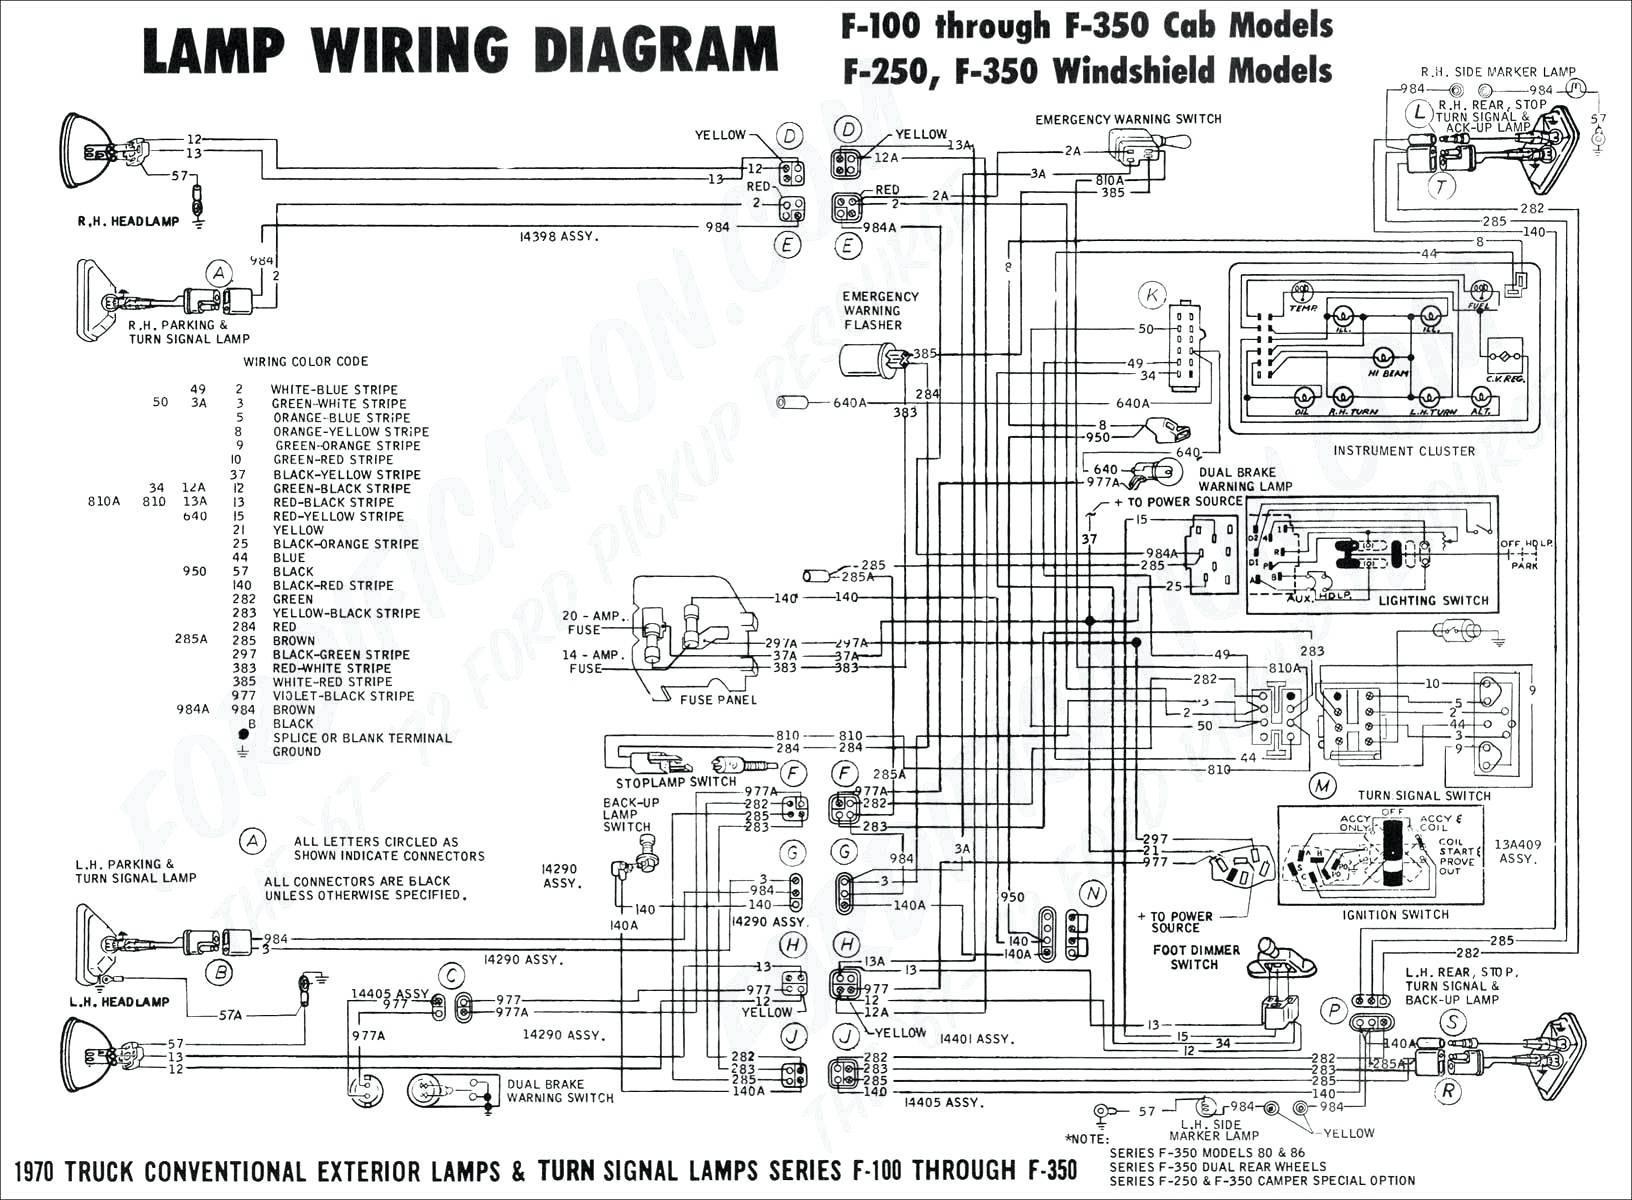 01 dodge dakota wiring diagram craftsman lt2000 solenoid durango engine 97